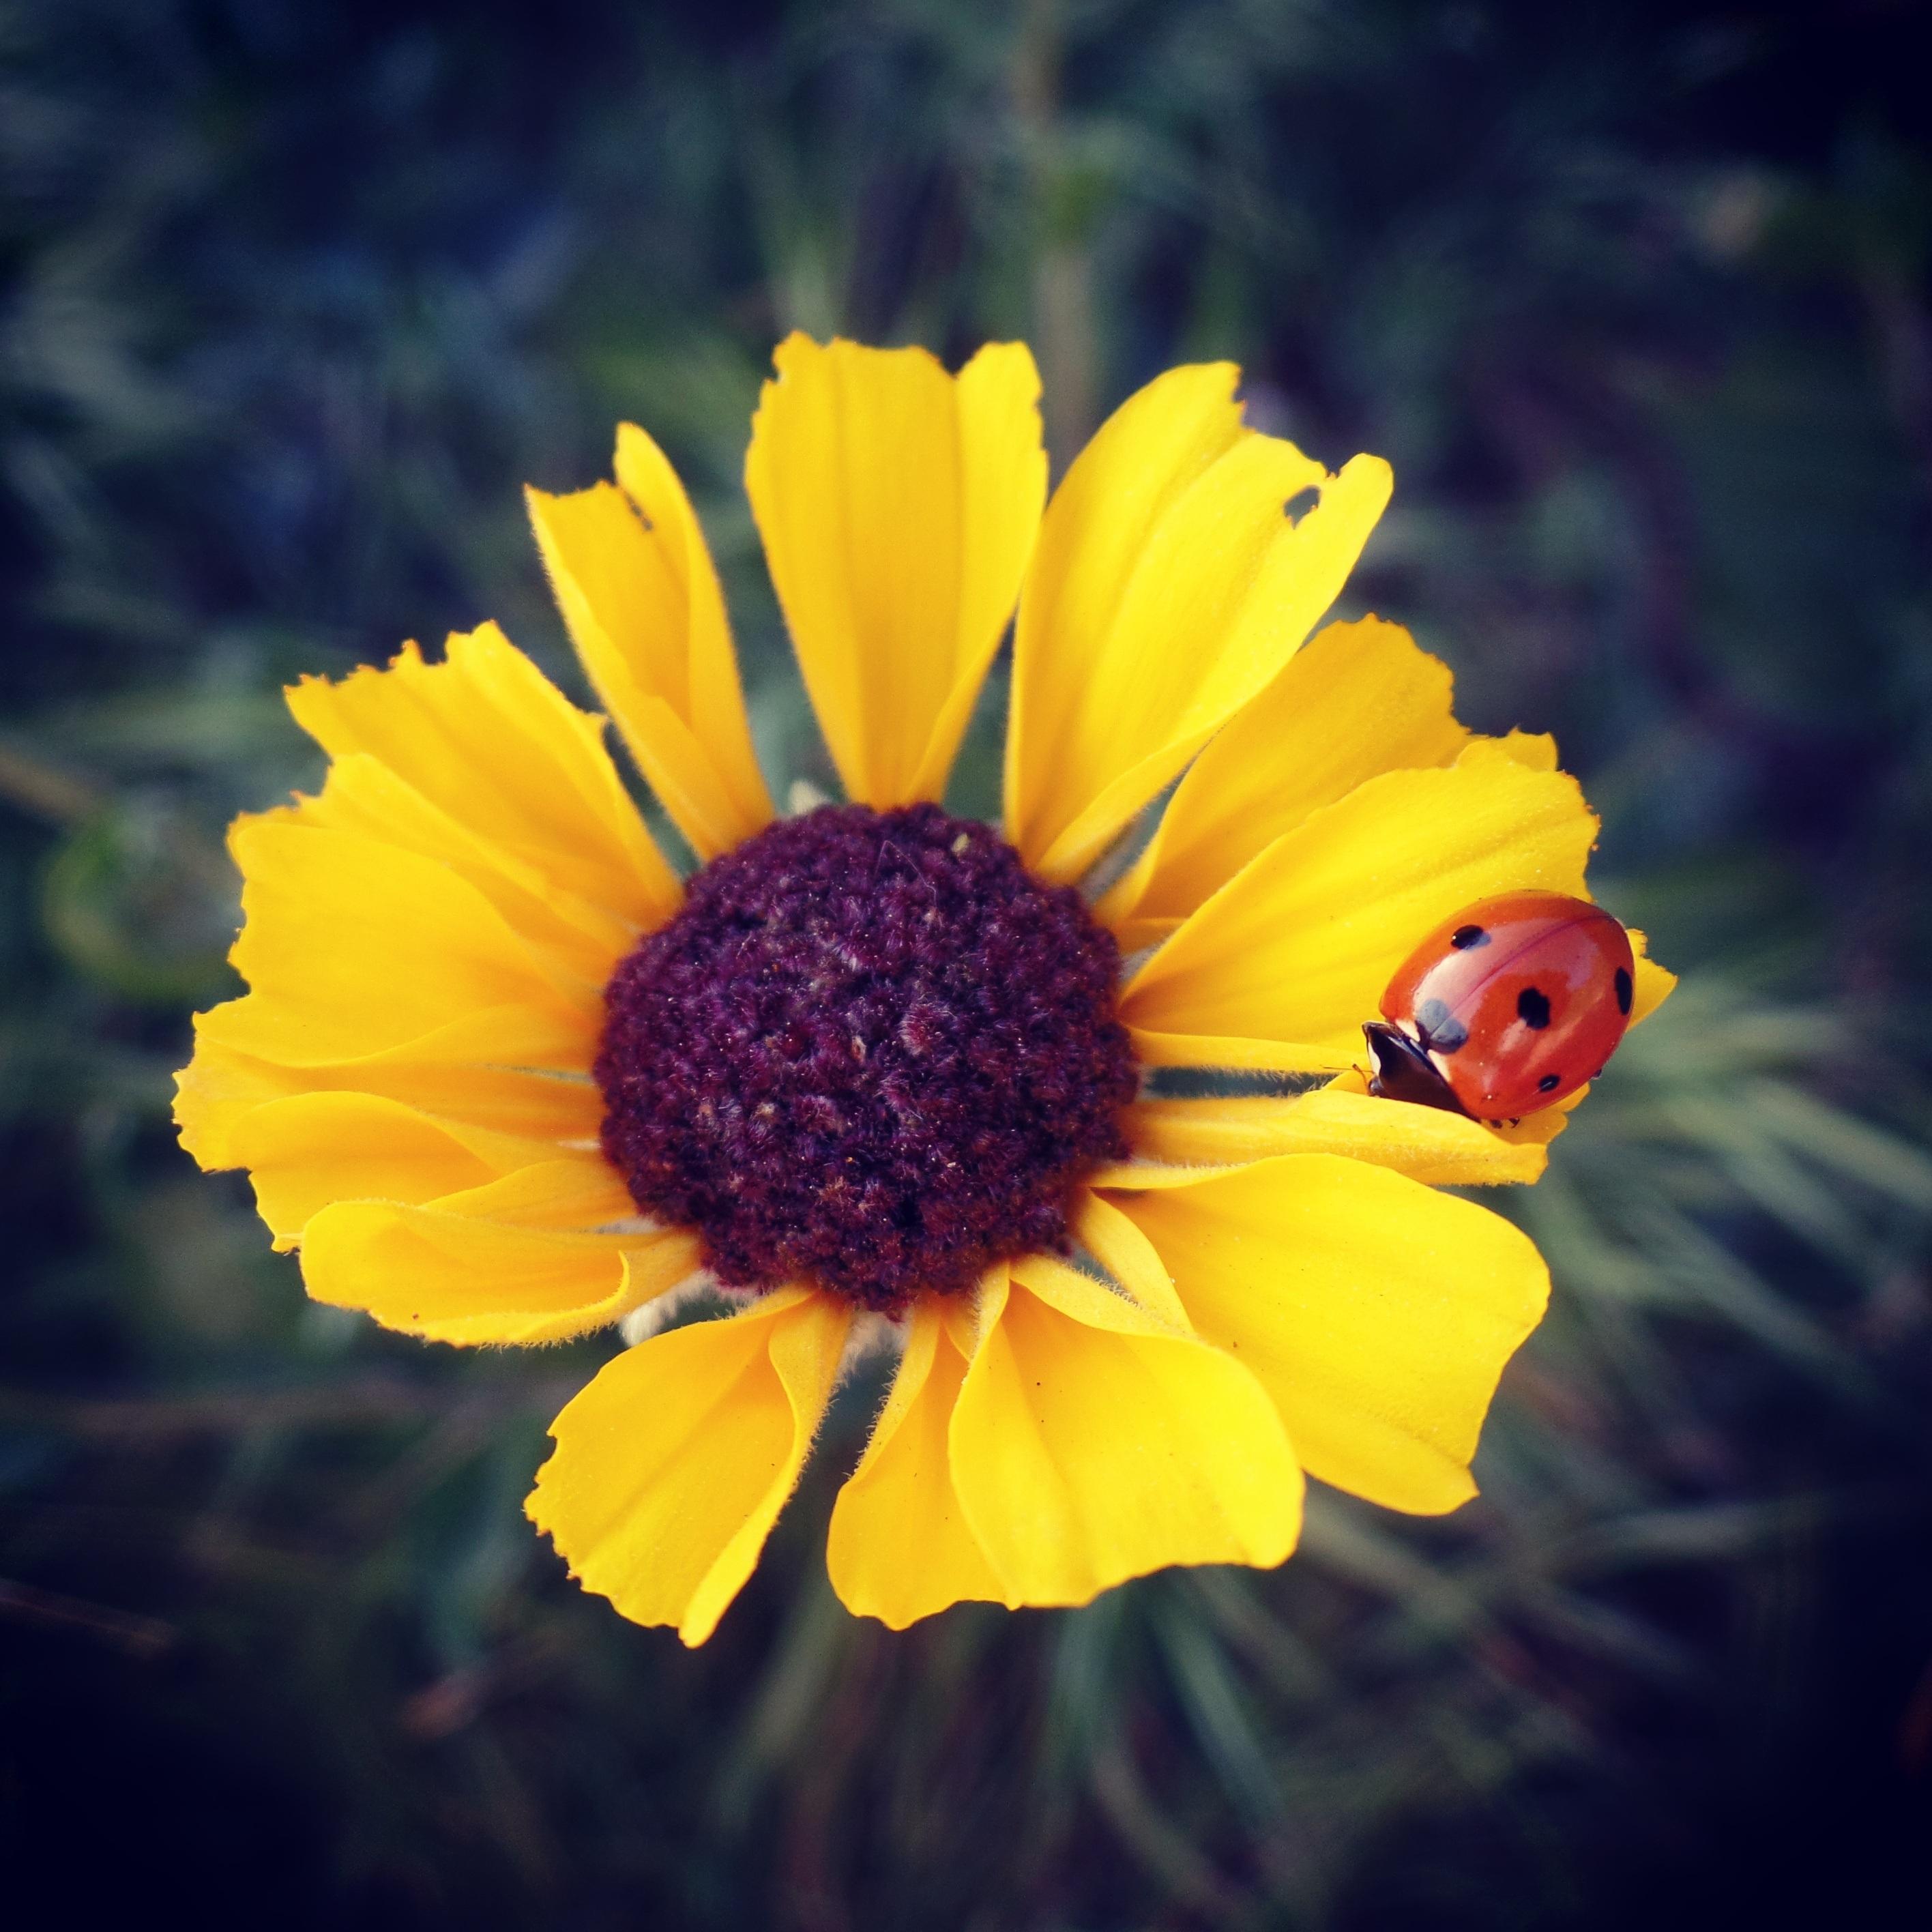 Fotos gratis naturaleza fotograf a p talo primavera - Coccinella foto gratis ...